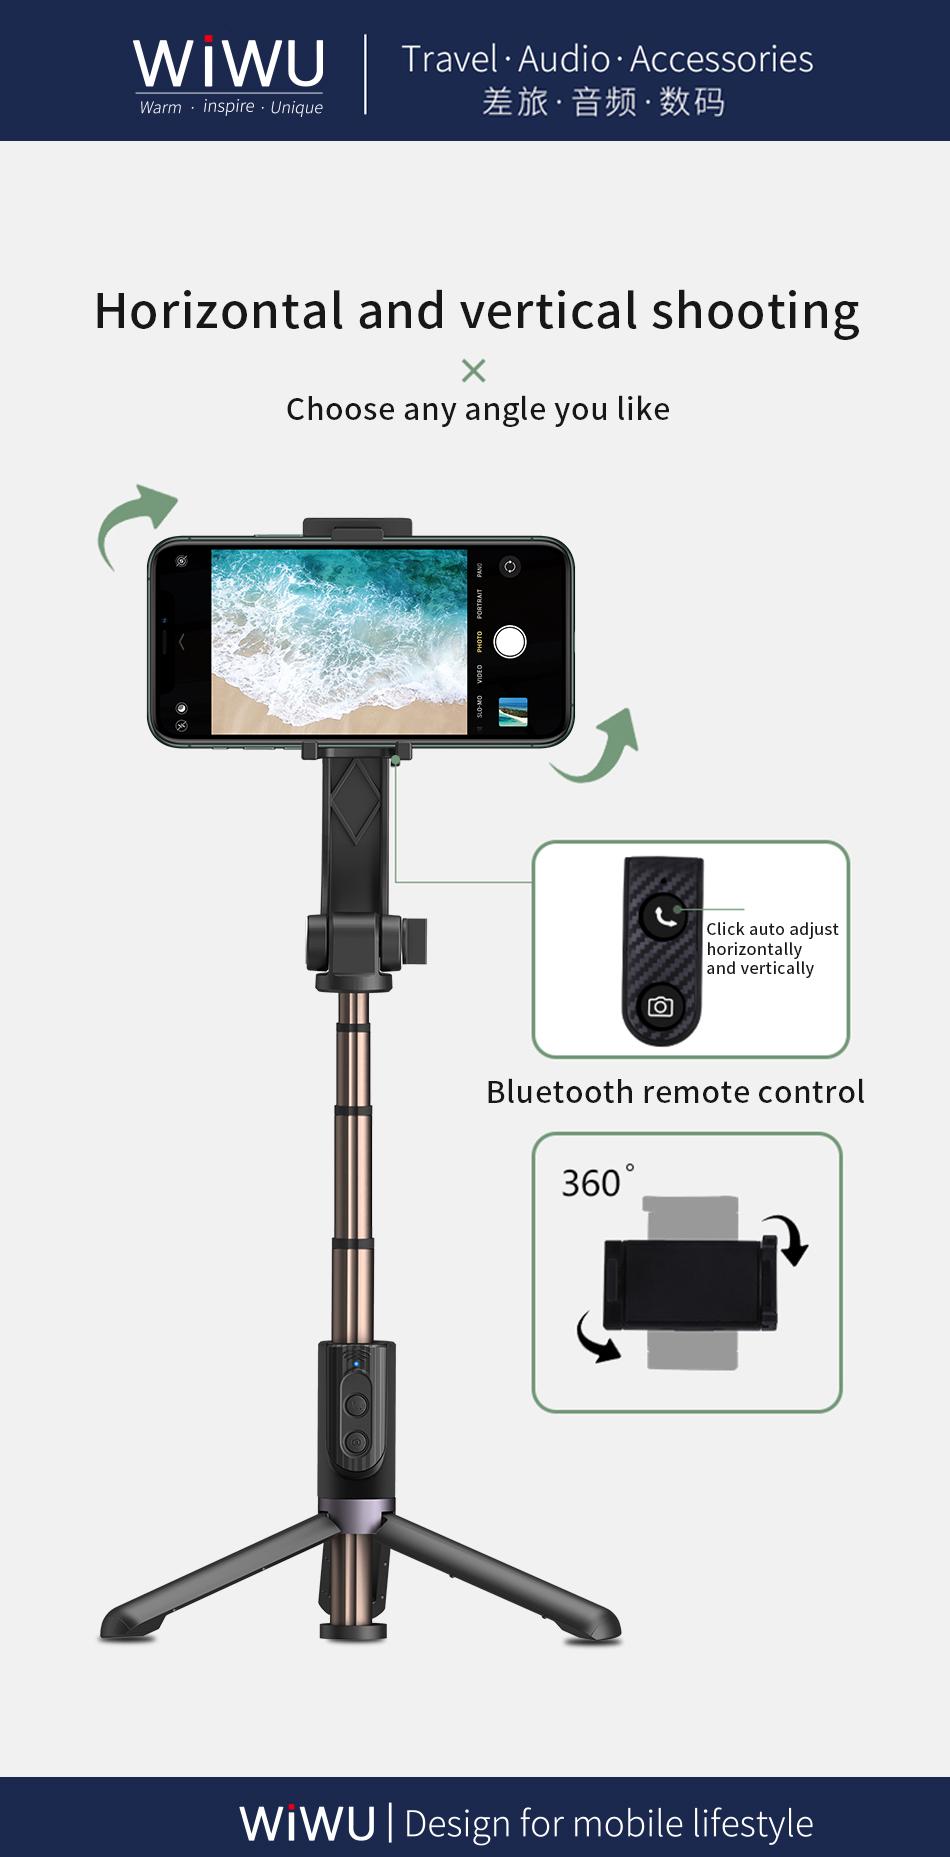 WIWU 手机自拍杆带蓝牙遥控 (https://www.wiwu.net.cn/) 手机支架 第1张